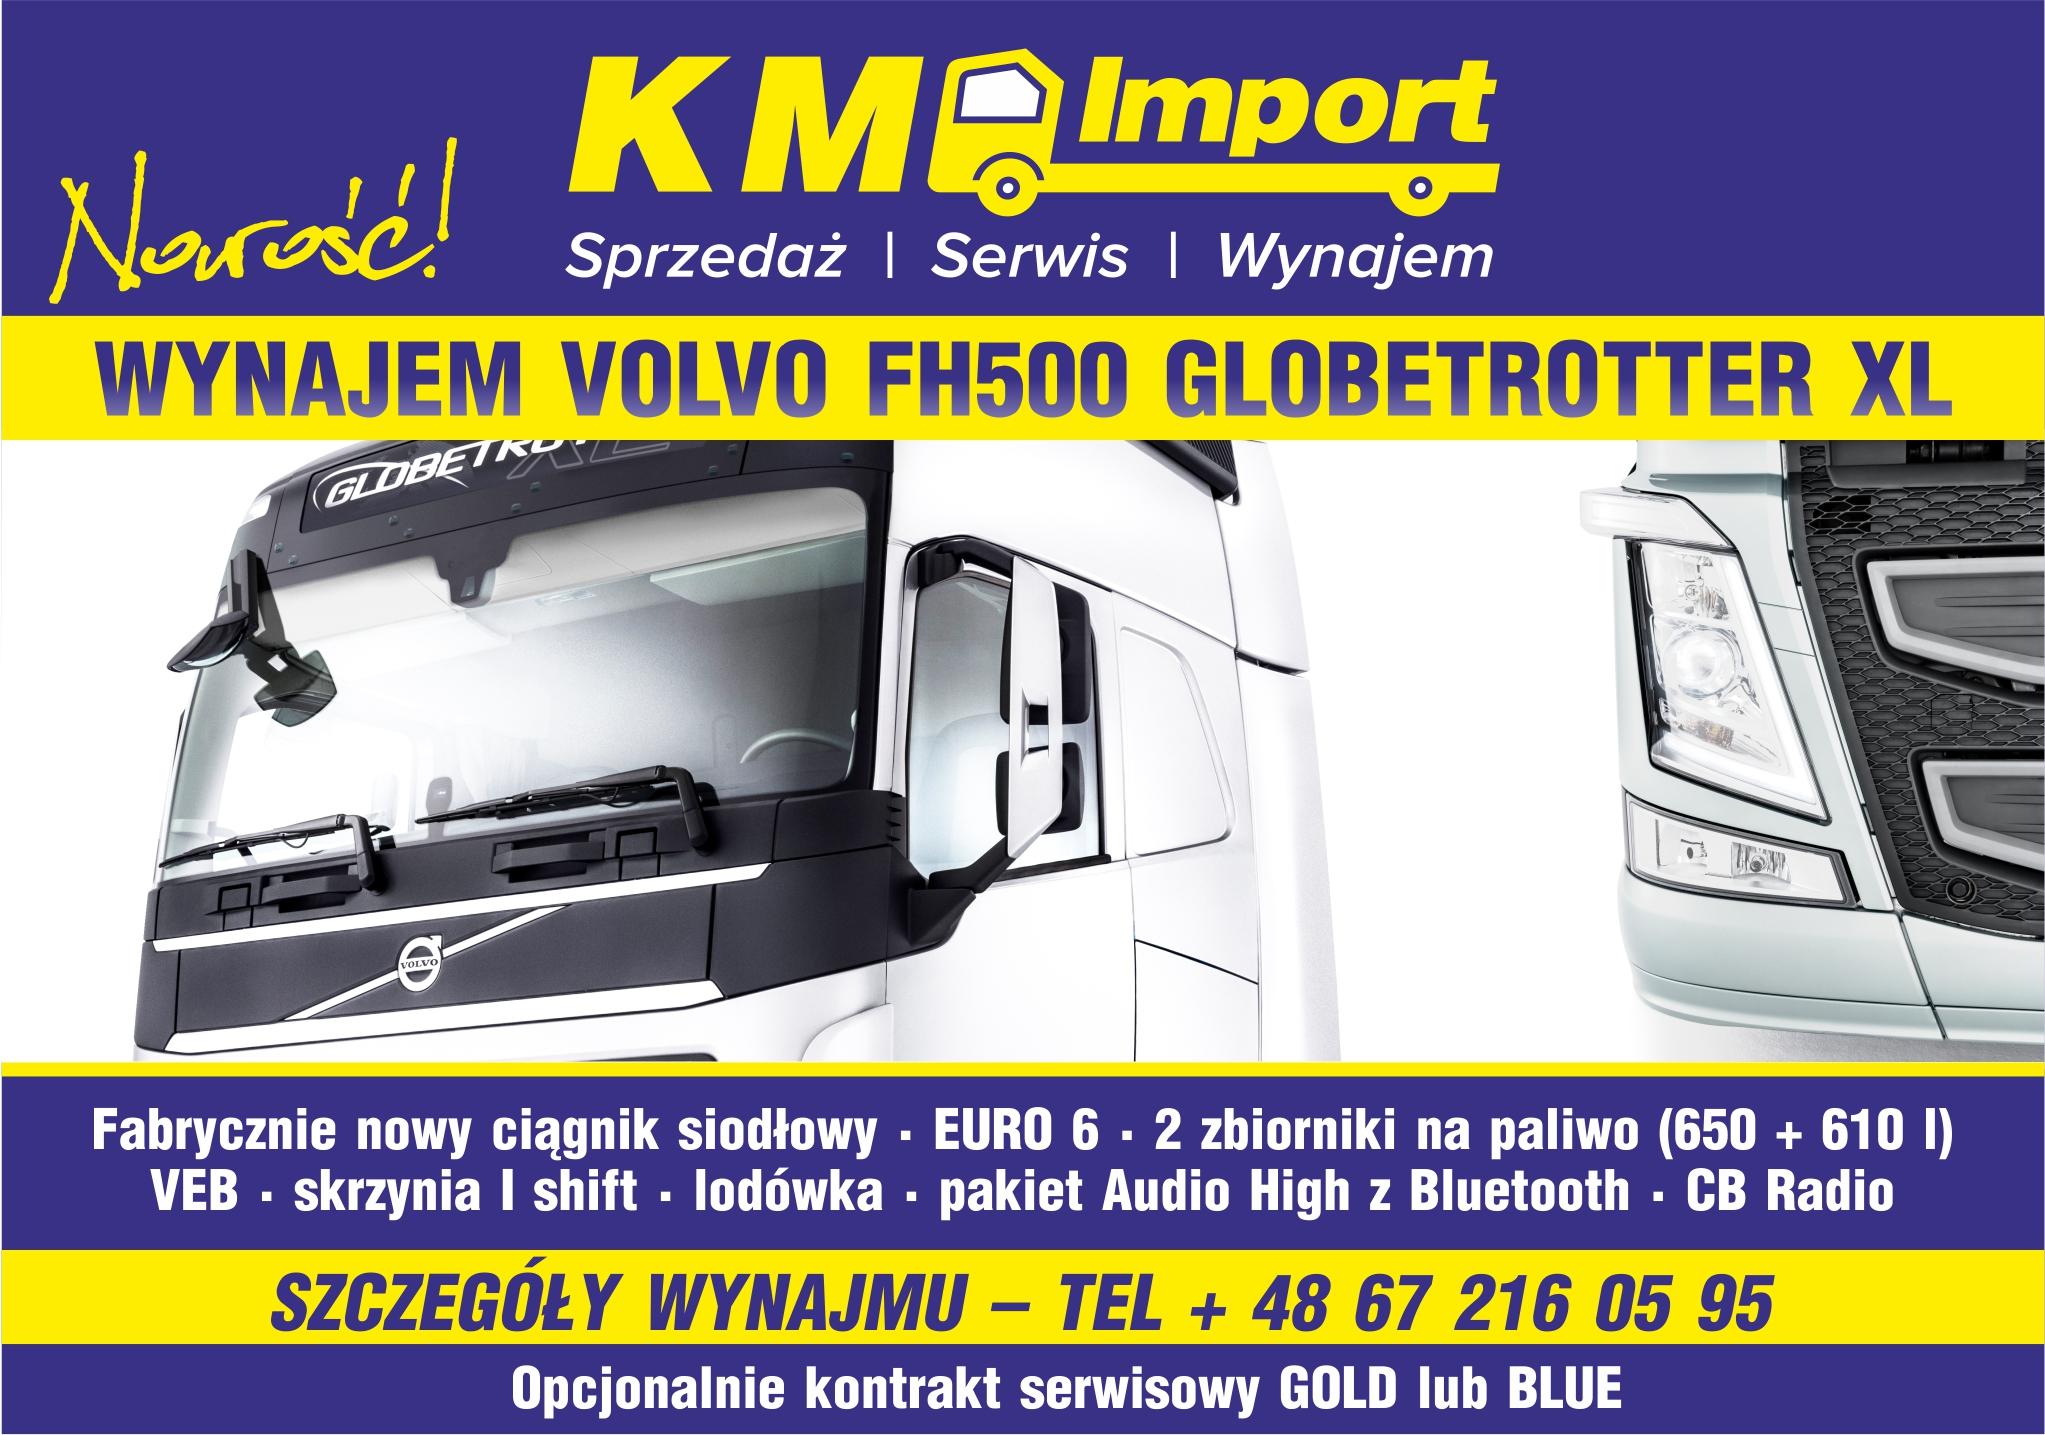 10 x VOLVOFH500 NA WYNAJEM - KM Import